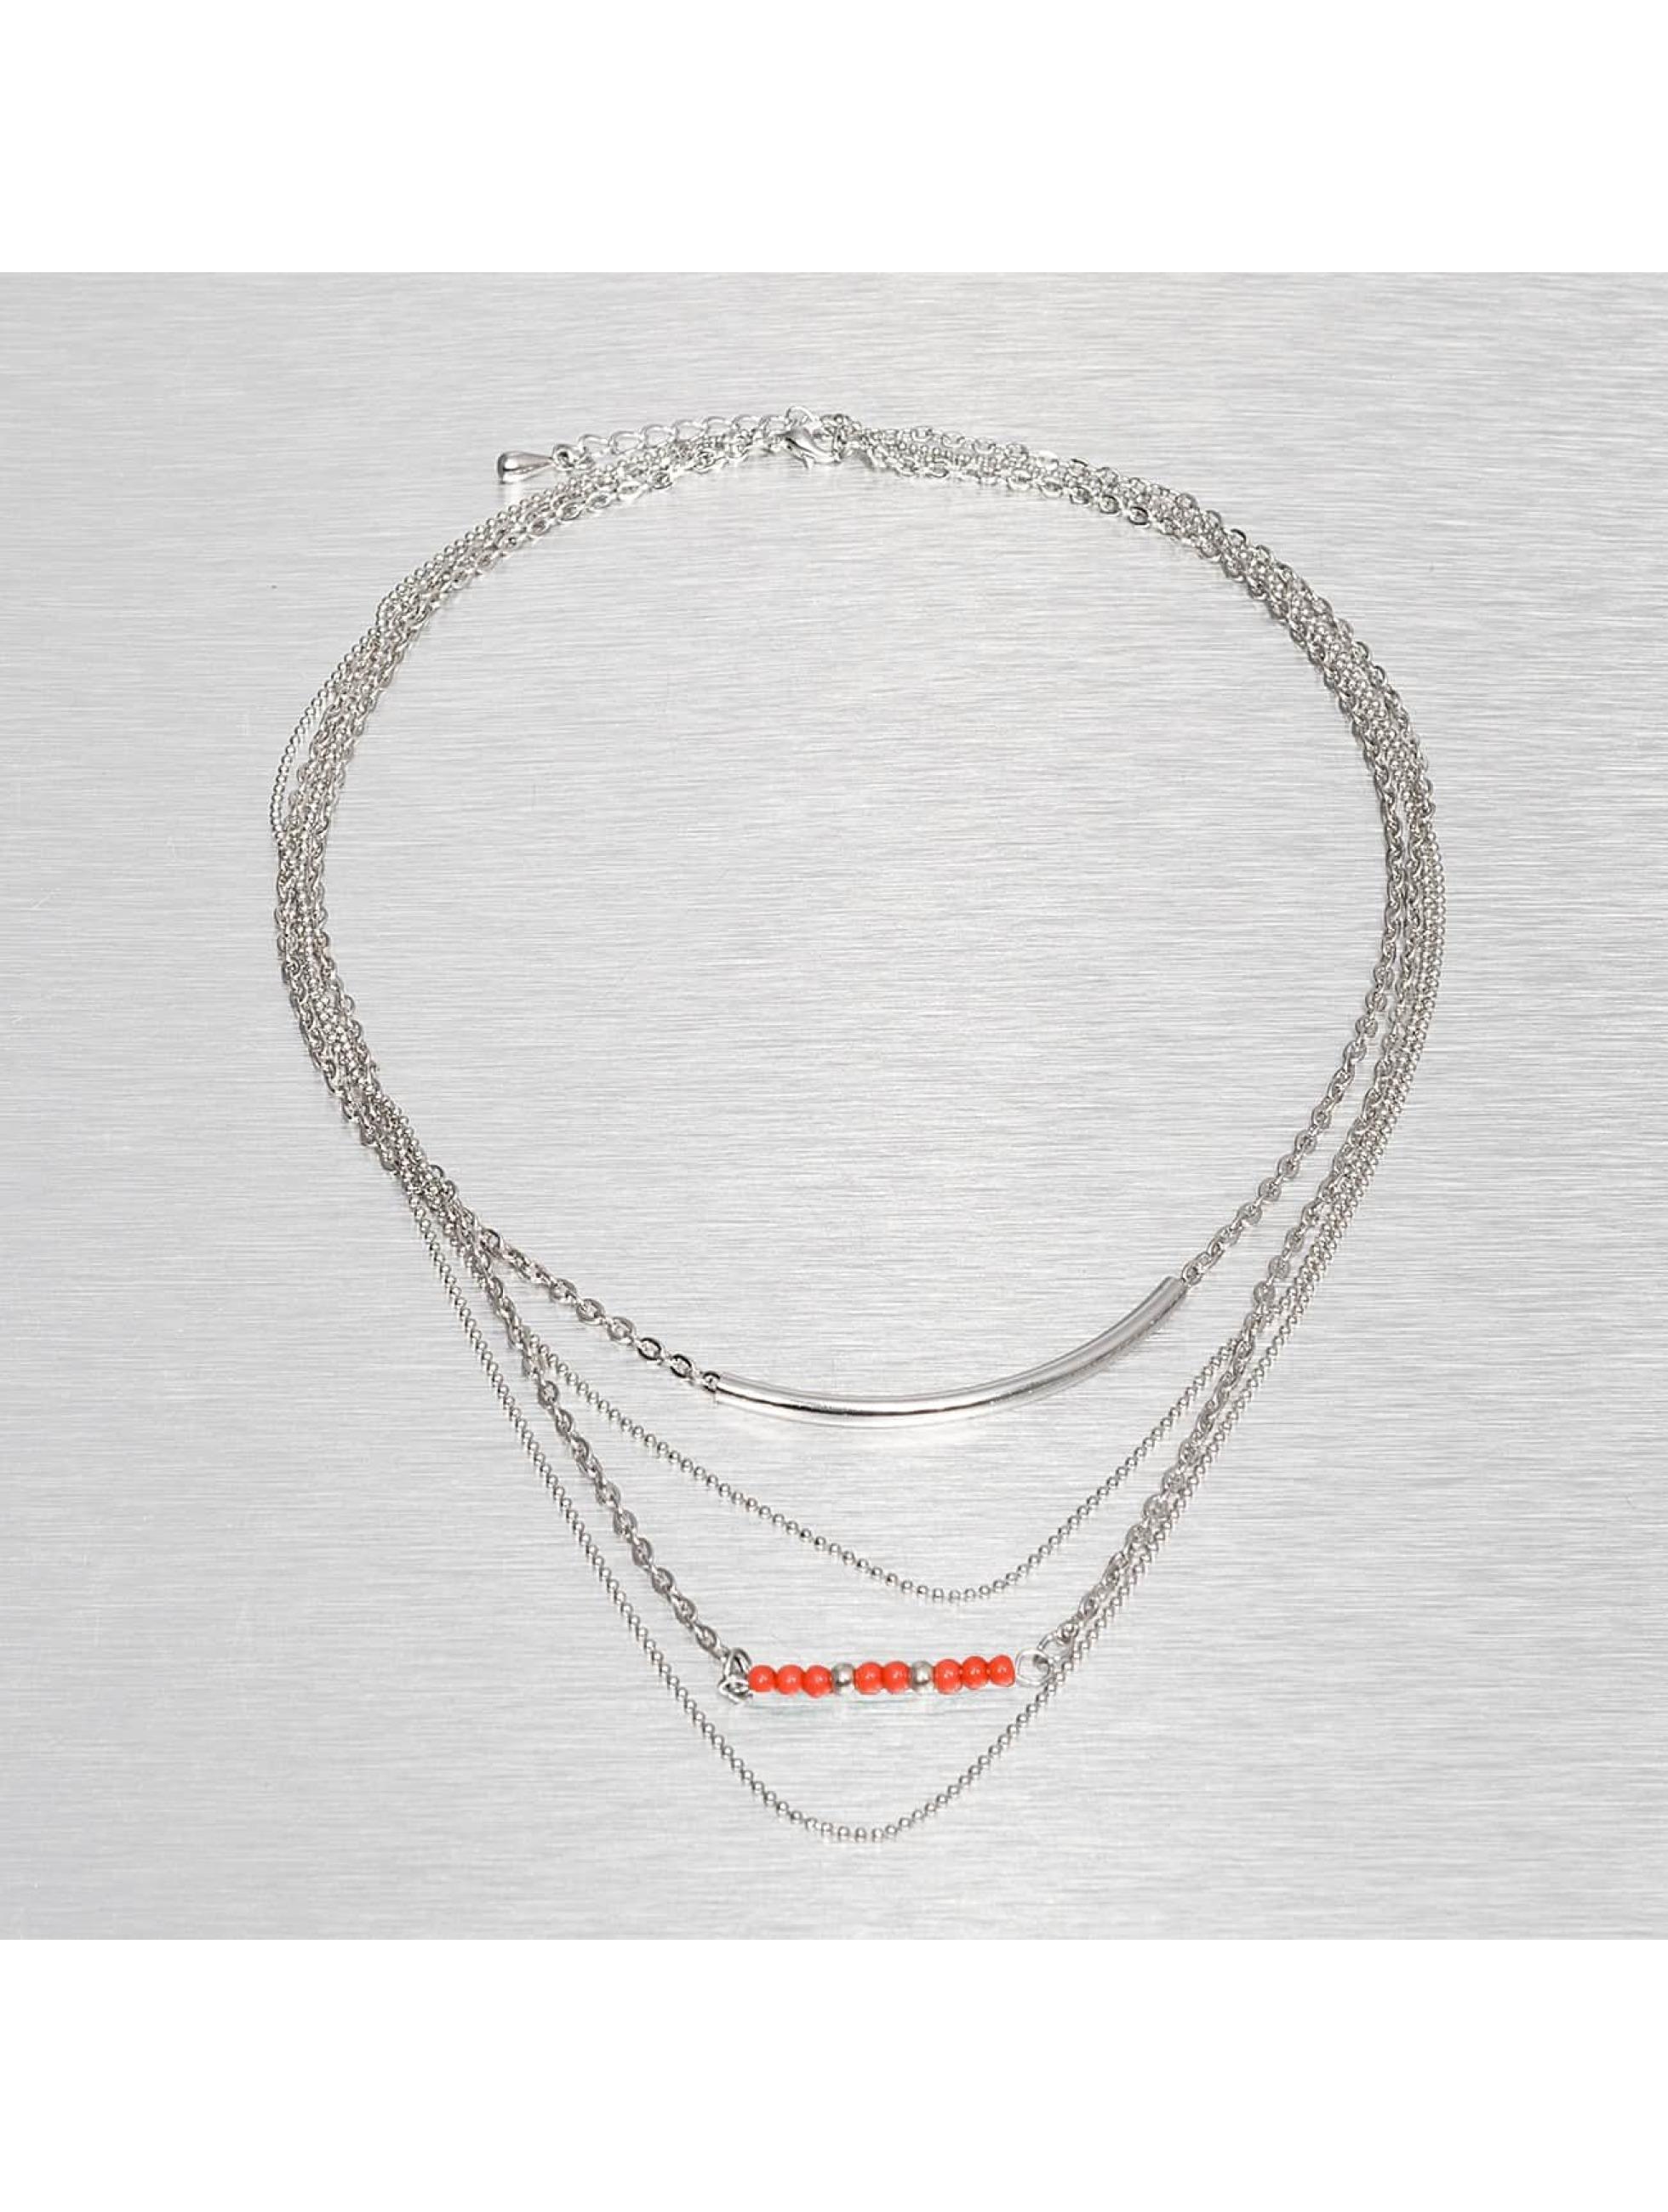 Vero Moda Accessoires / Colliers vmViva Necklace en argent